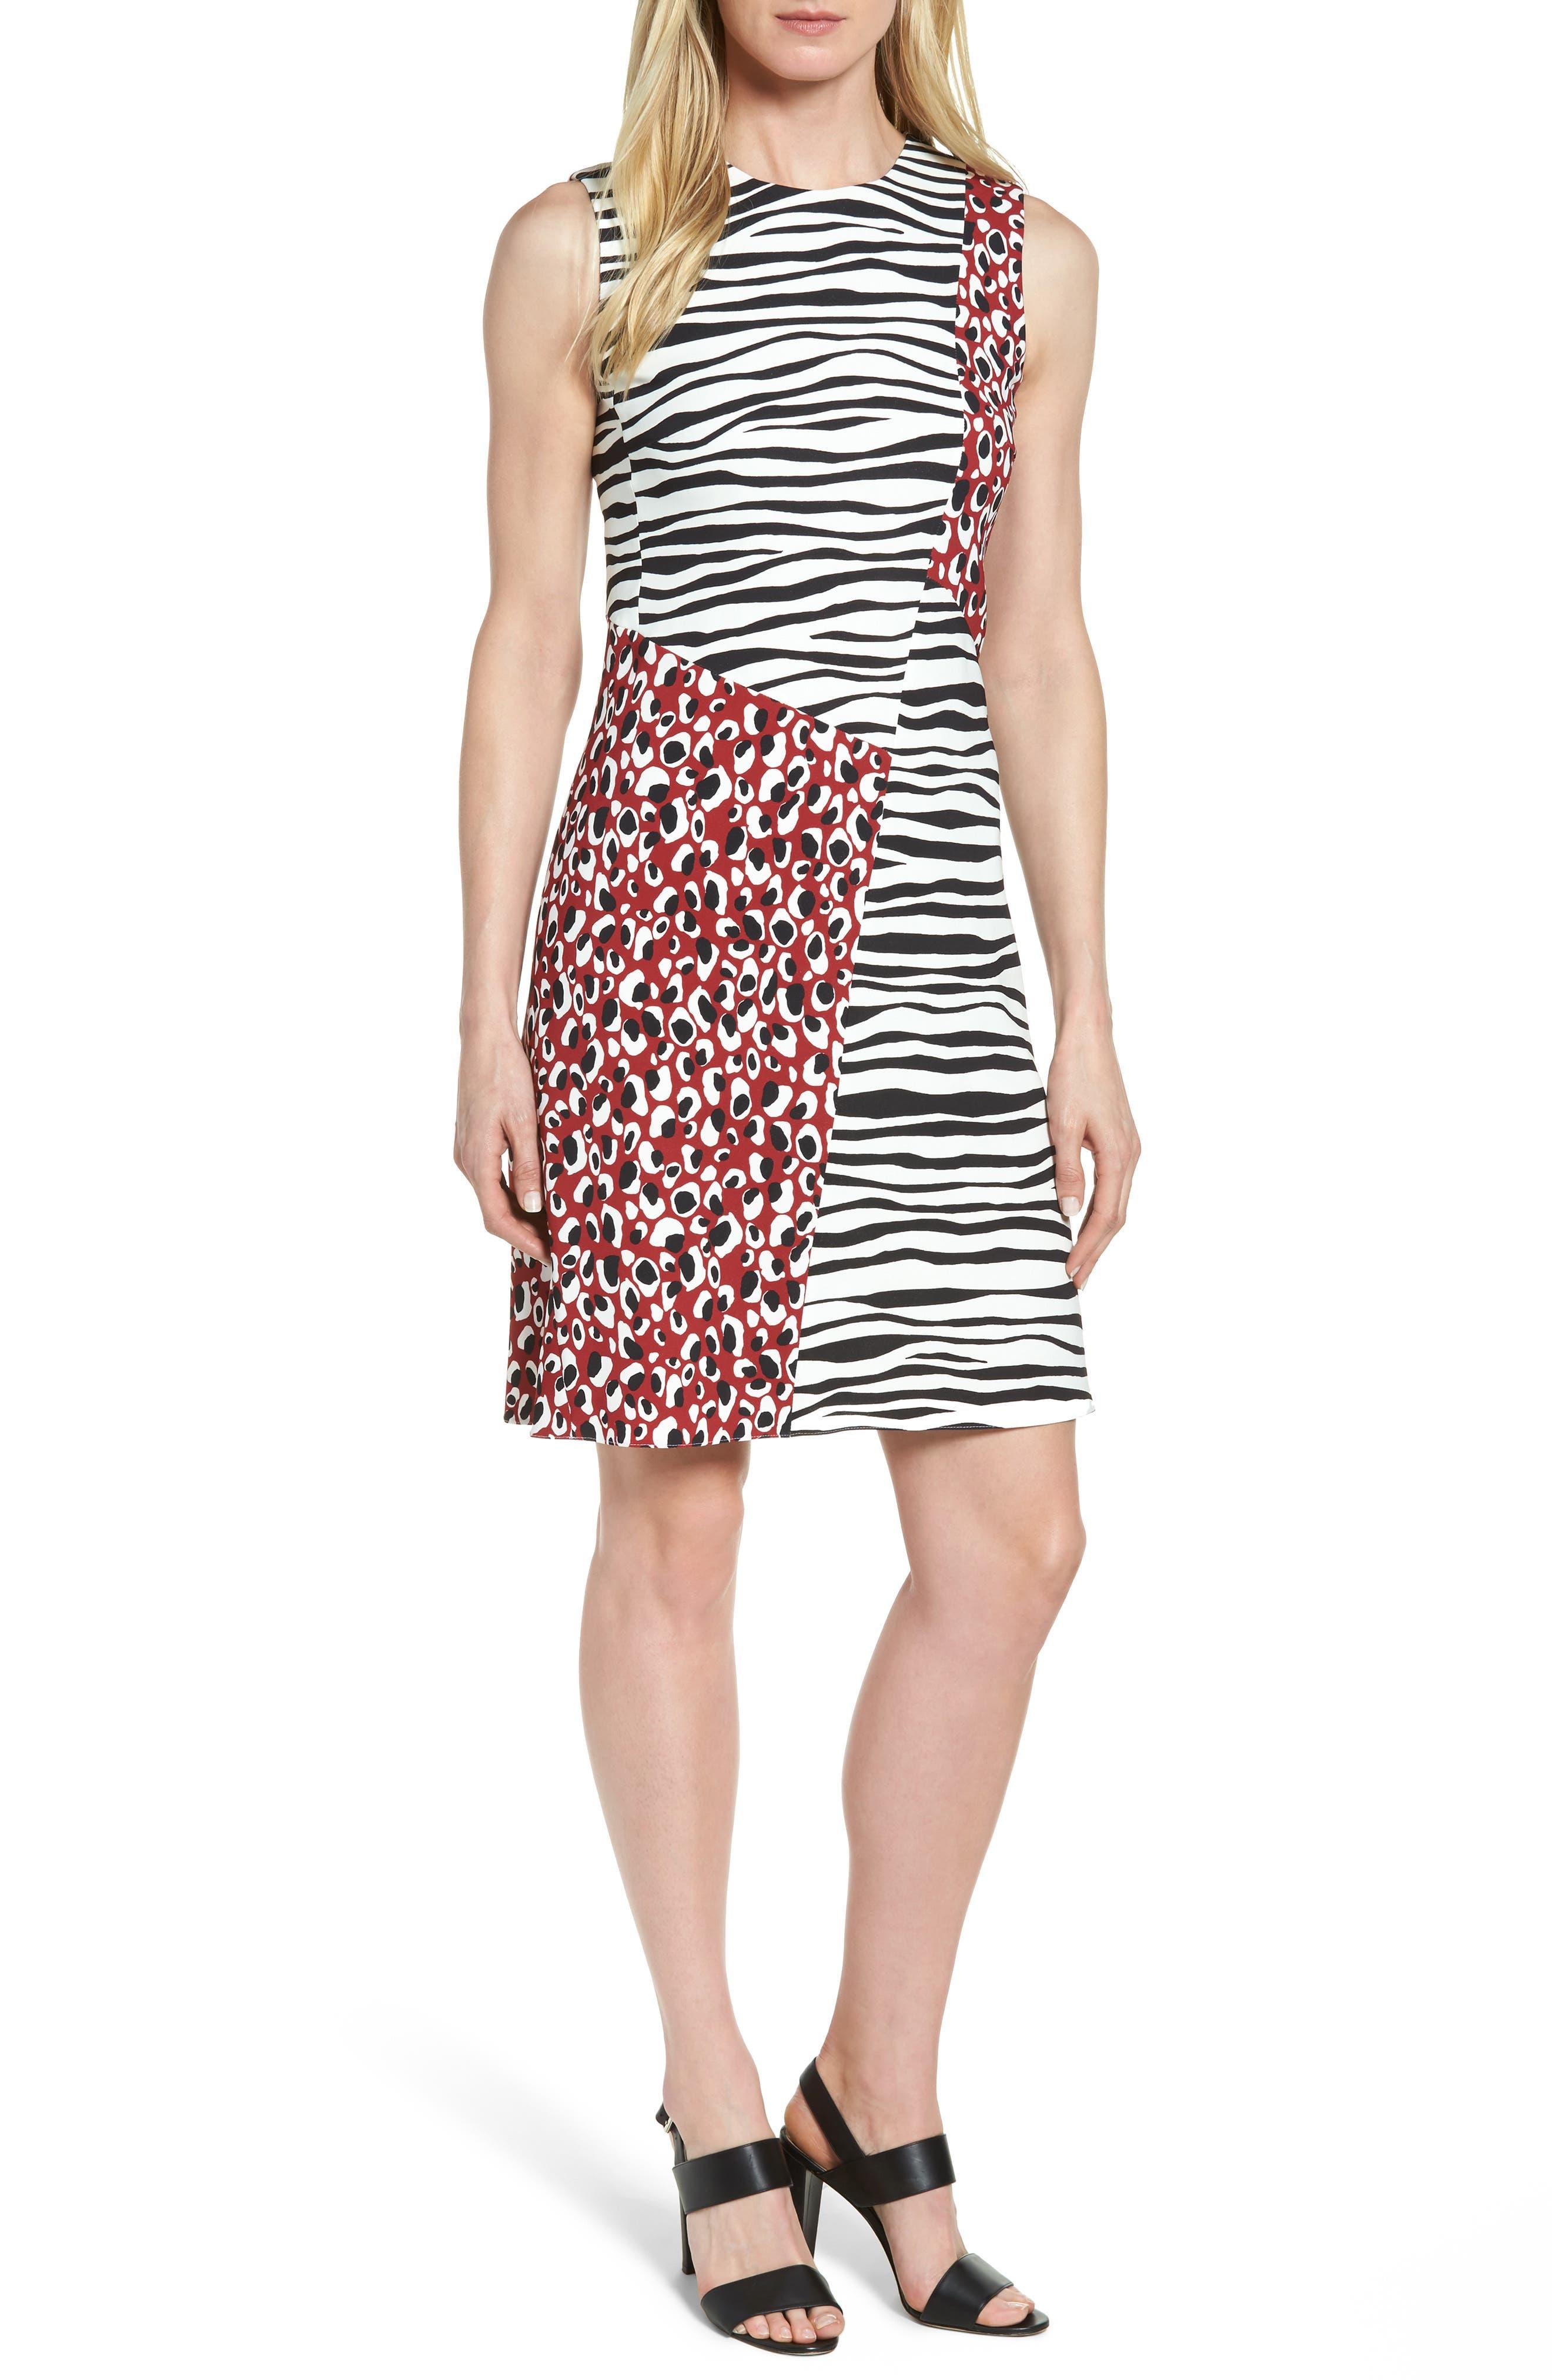 Diseba Animal Print Sheath Dress,                         Main,                         color, Pomegranate Fantasy